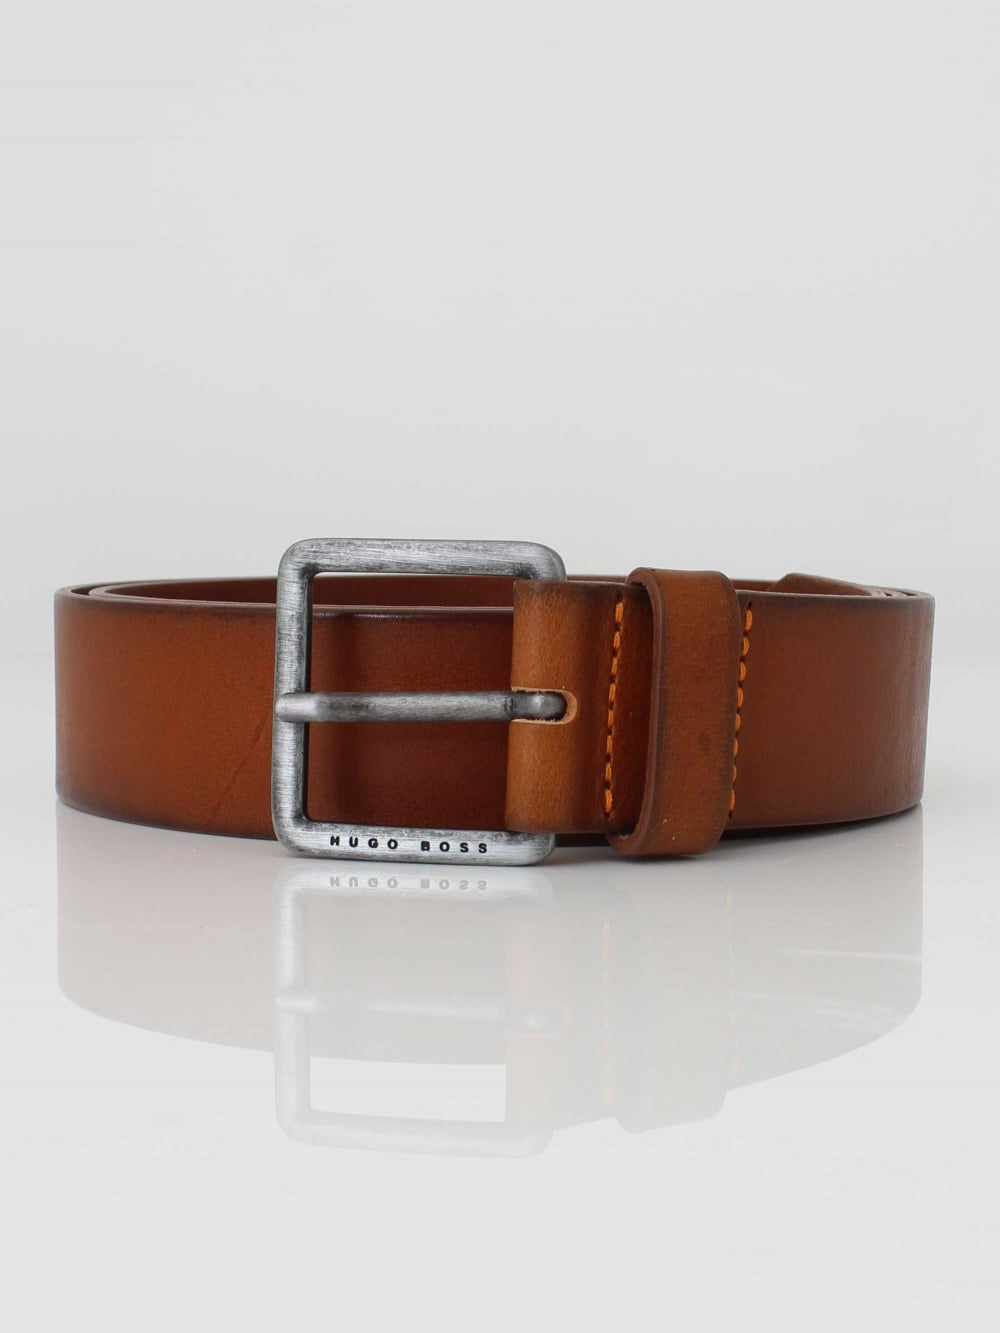 fcf247acccdf Hugo Boss Jeeko Leather Belt in Medium Brown | Northern Threads